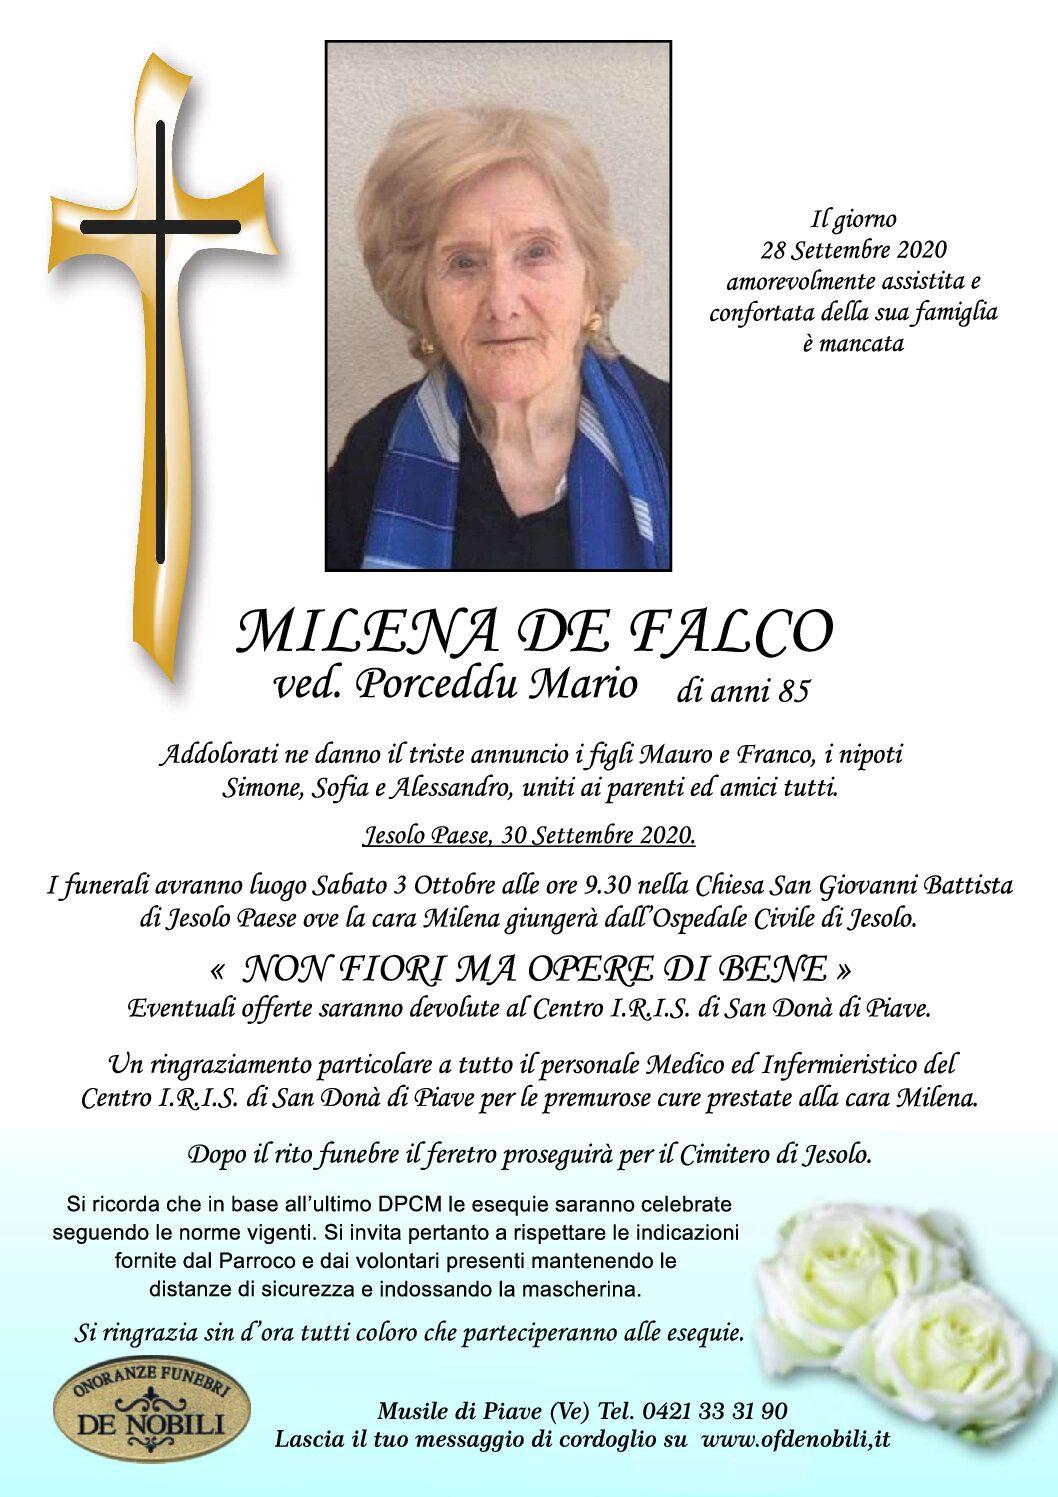 Milena De Falco